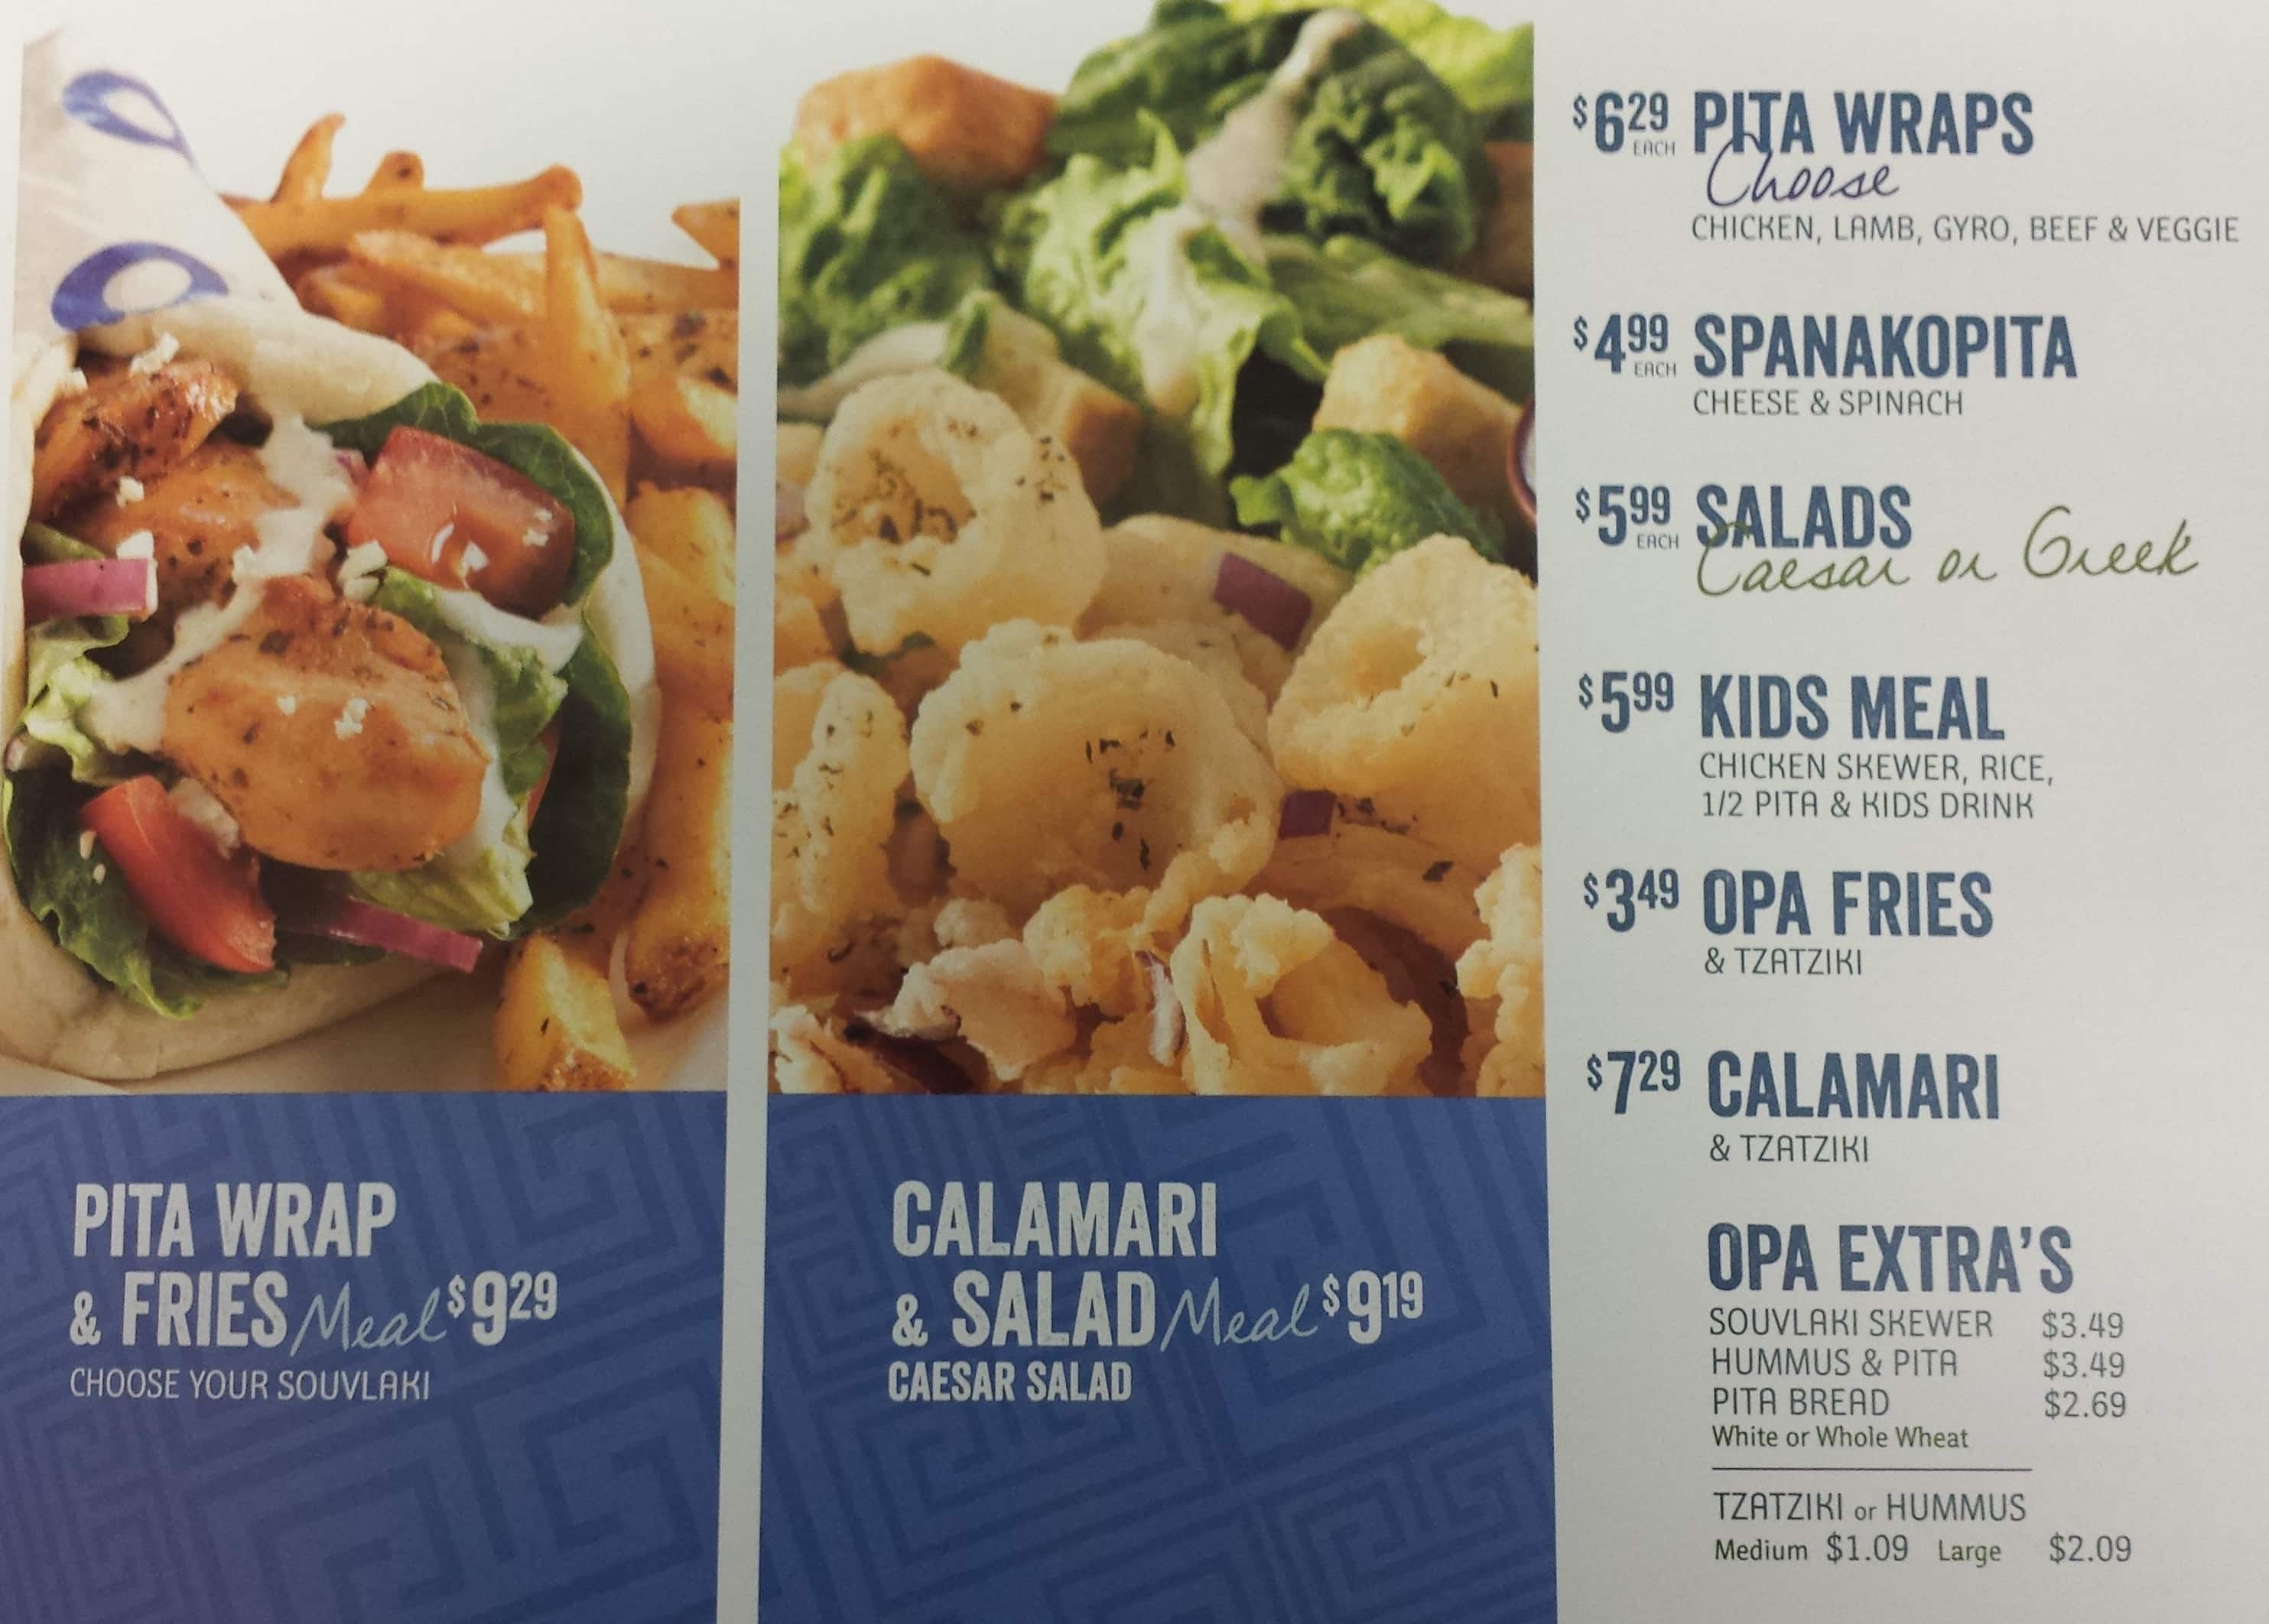 Fast Food Greek Food Calgary